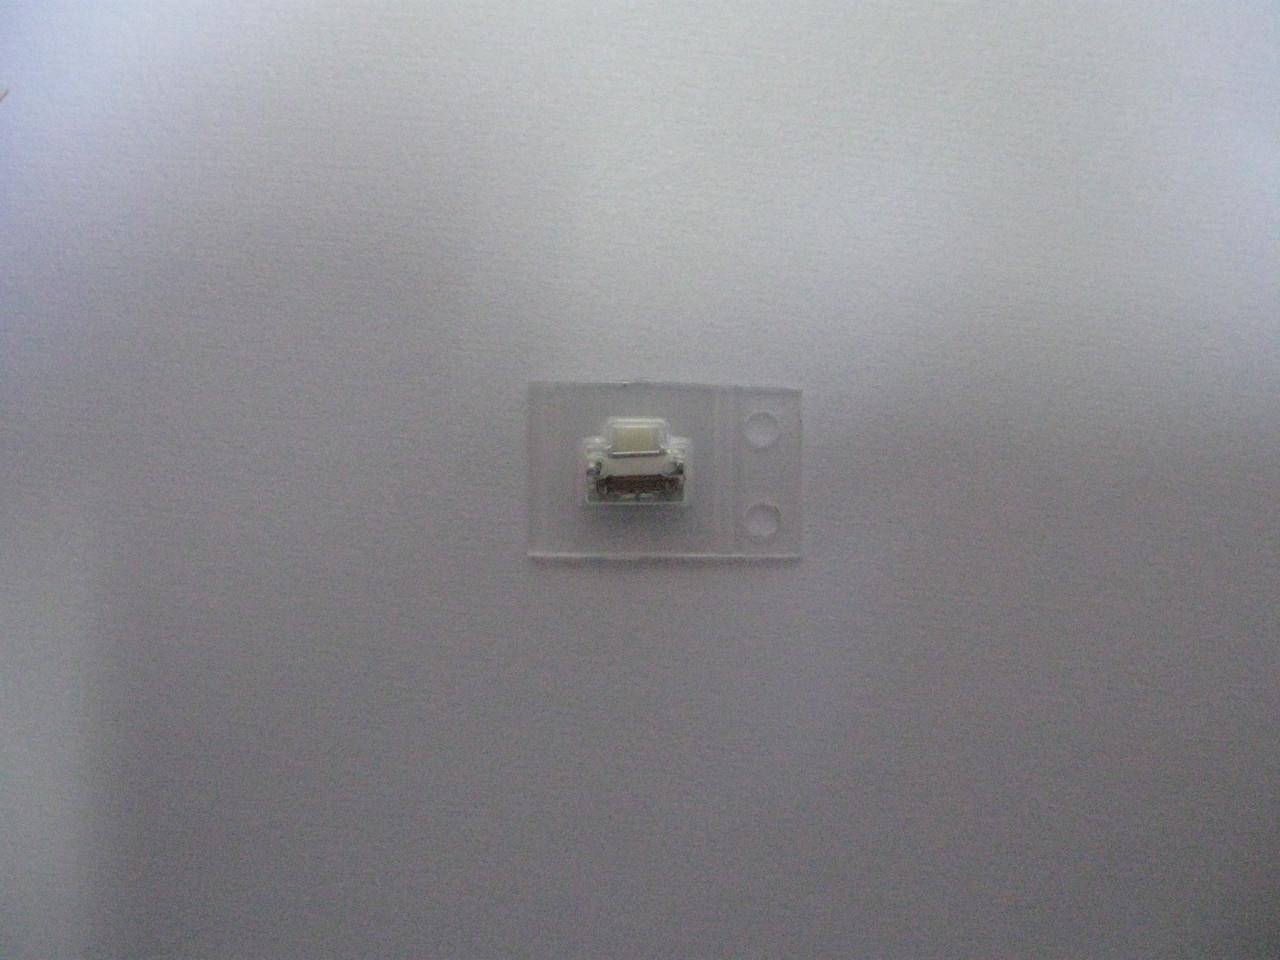 Кнопка включения Samsung 3404-001487